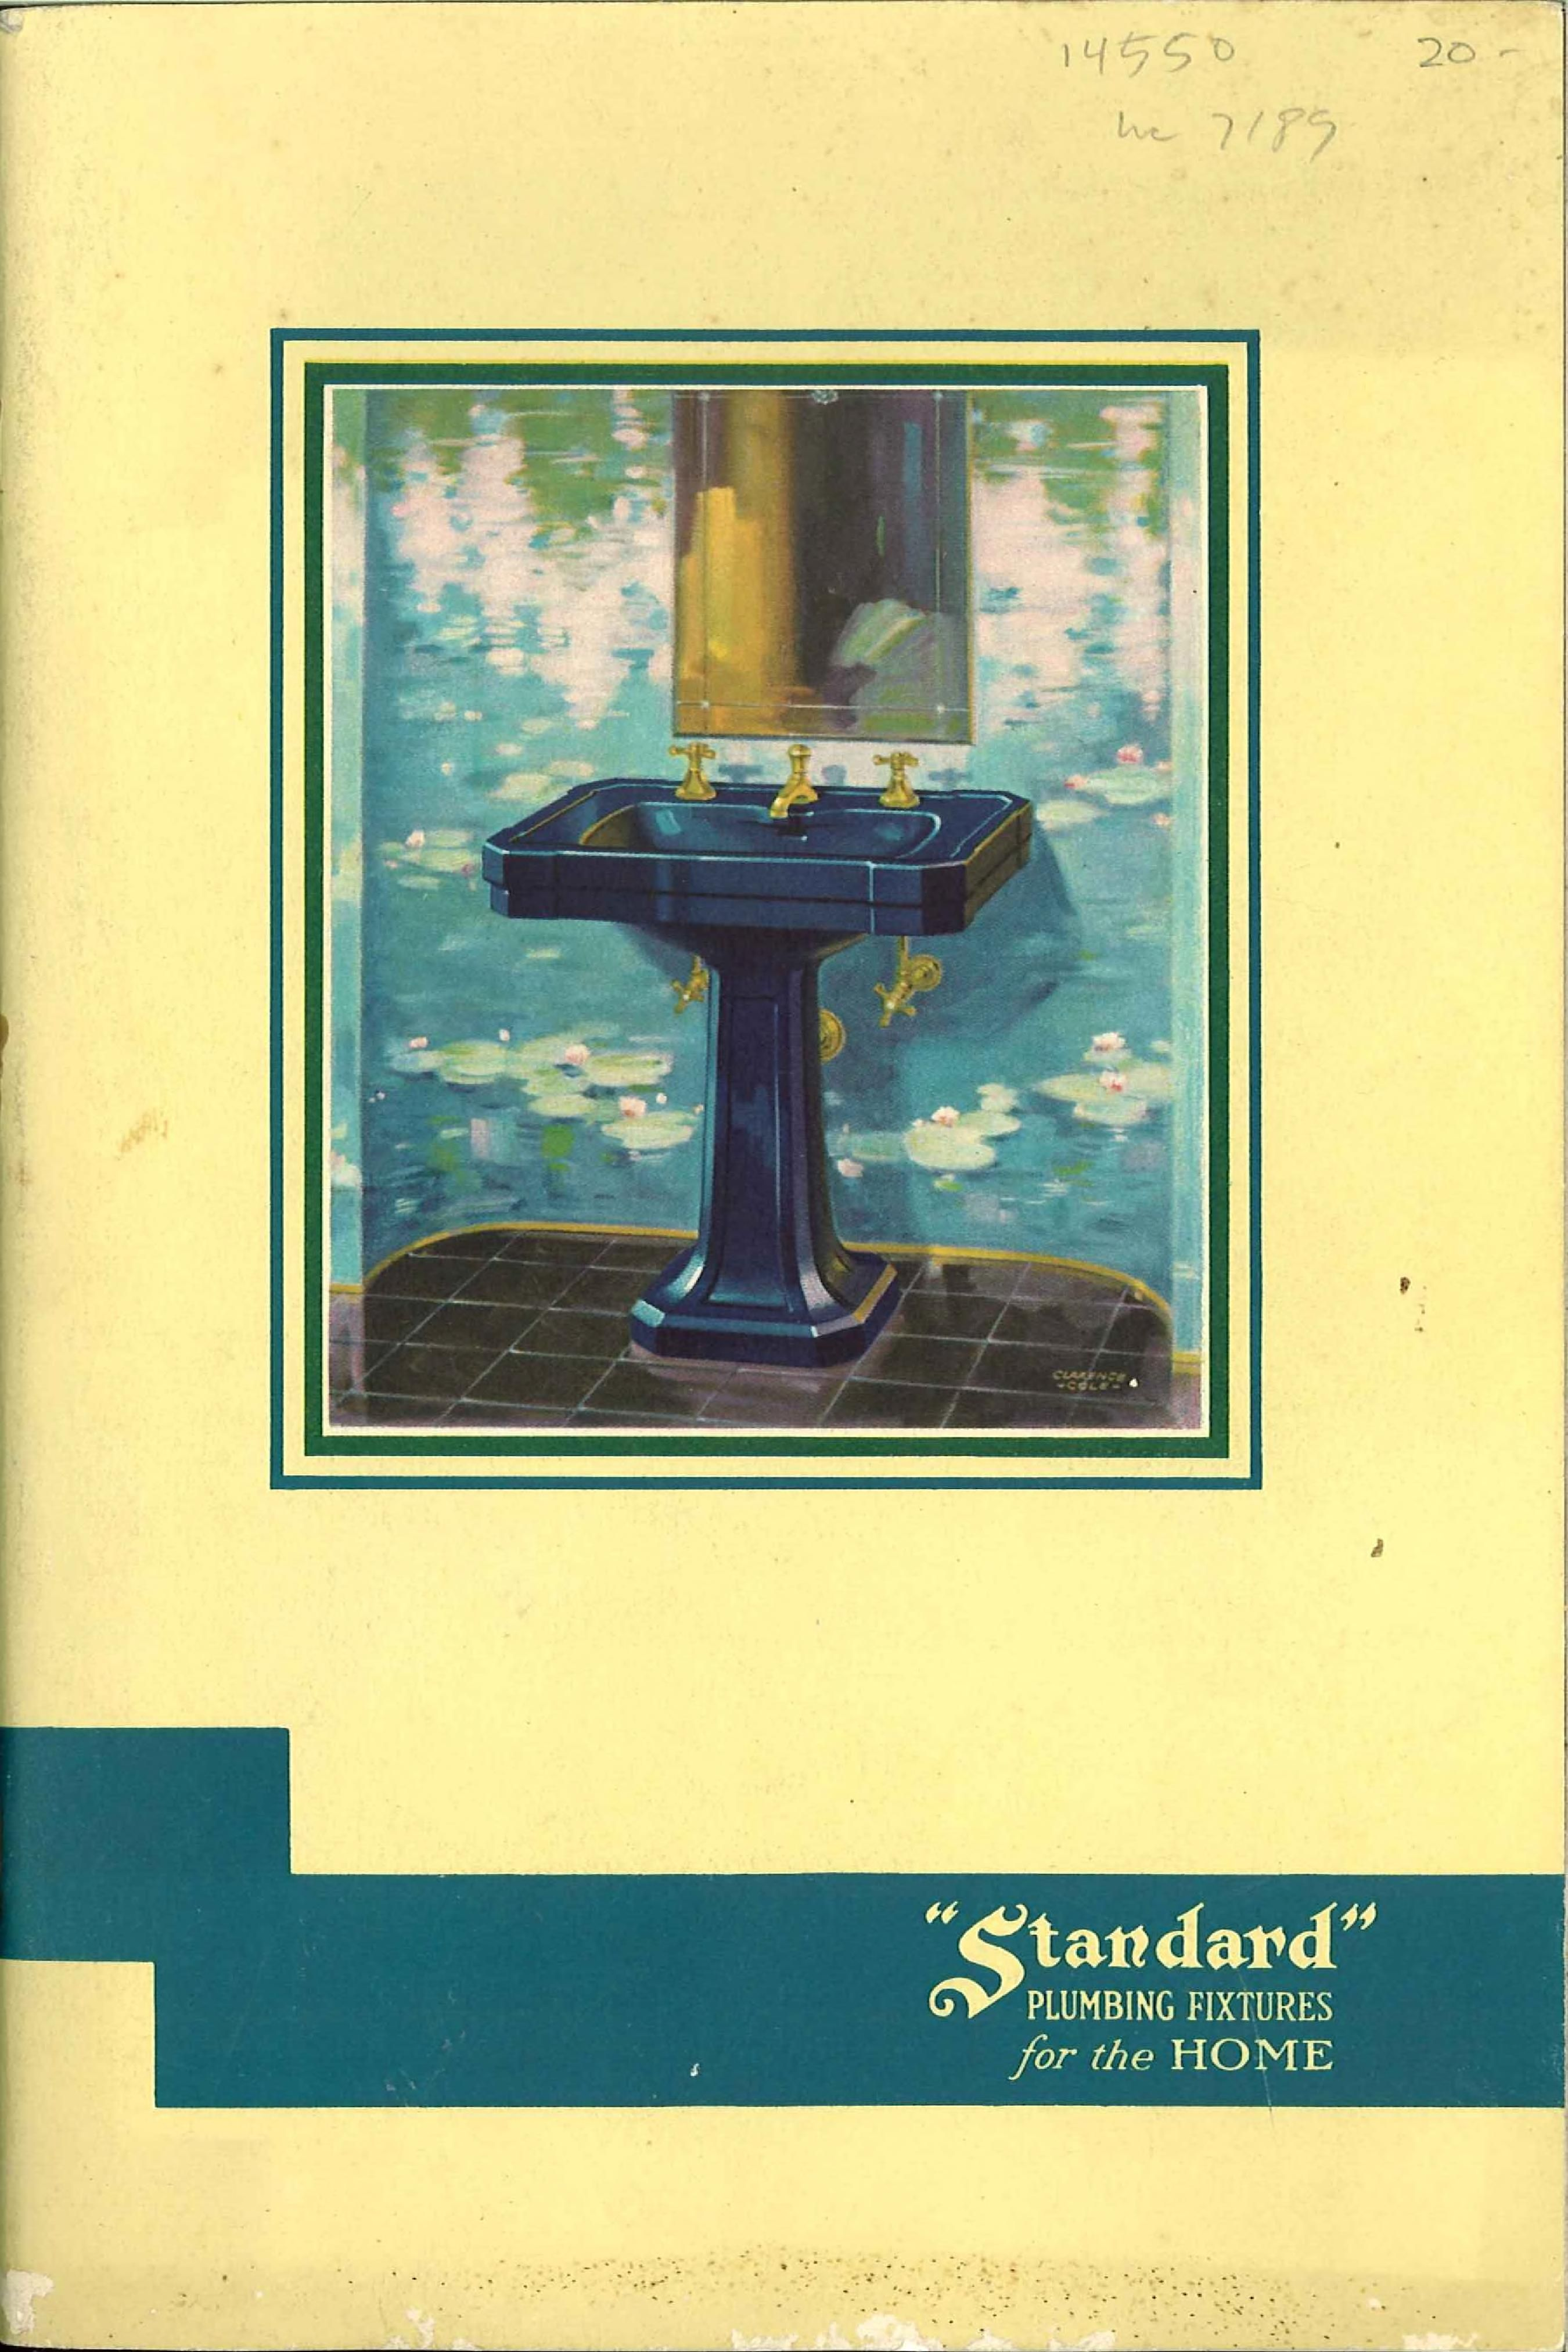 American Standard Plumbing Posters